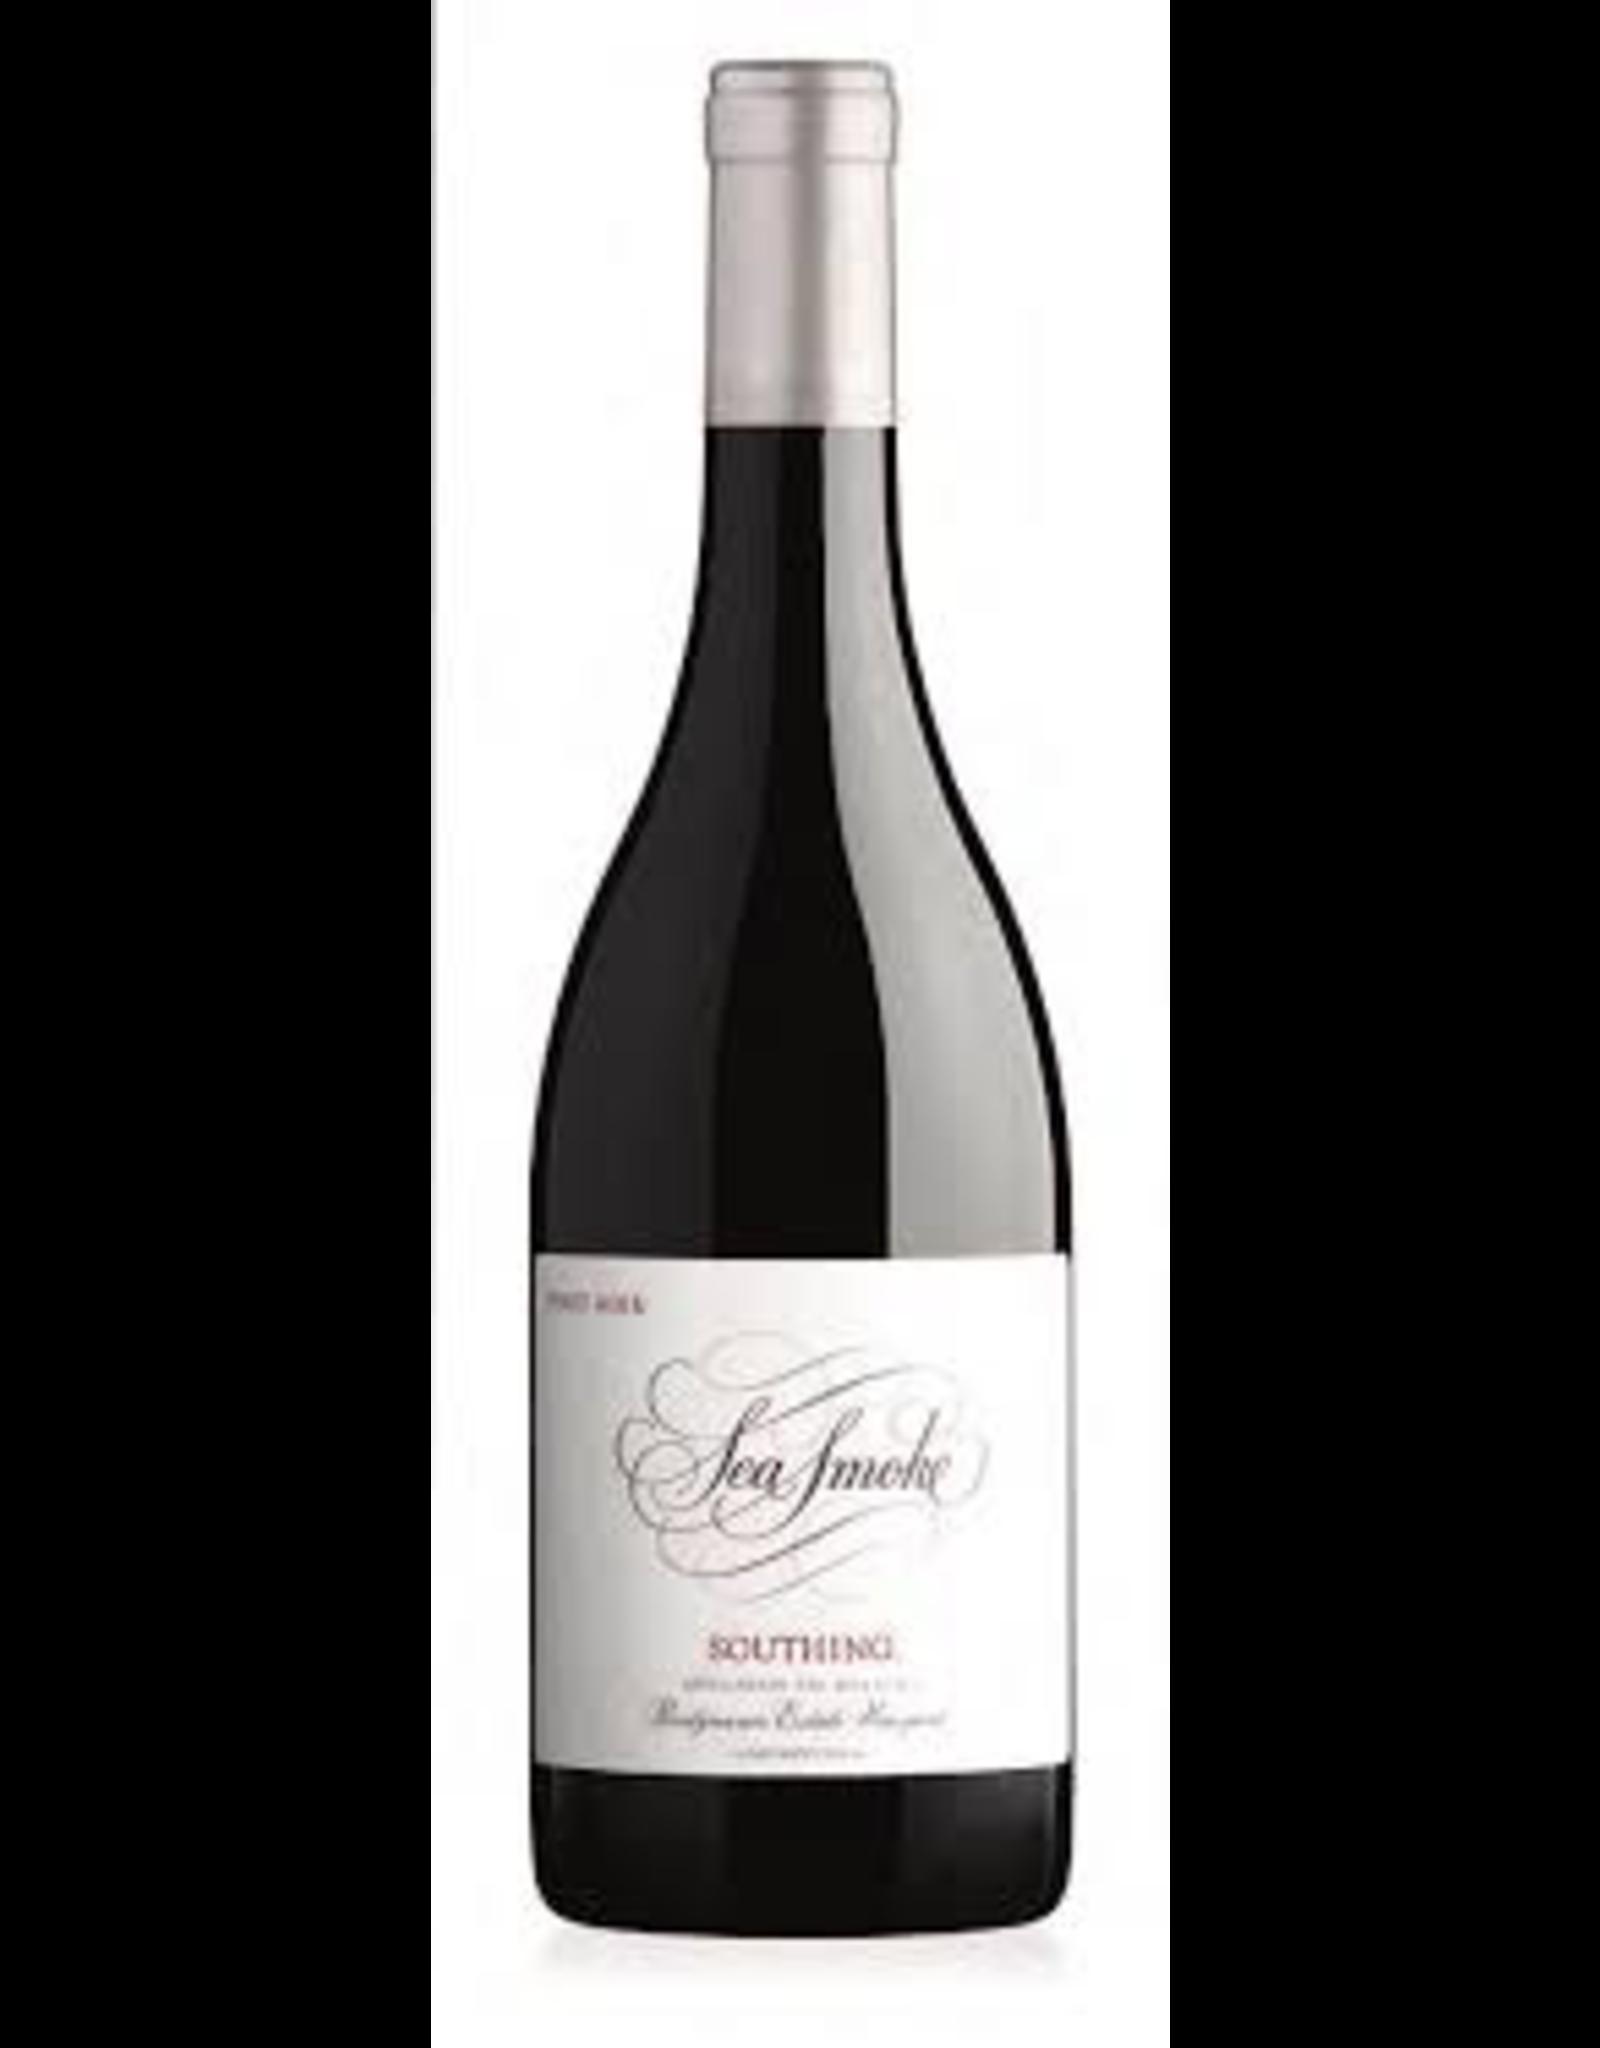 Red Wine 2017, Sea Smoke Southing, Pinot Noir, Sta. Rita Hills, Central Coast, California, 14.5% Alc, CTnr